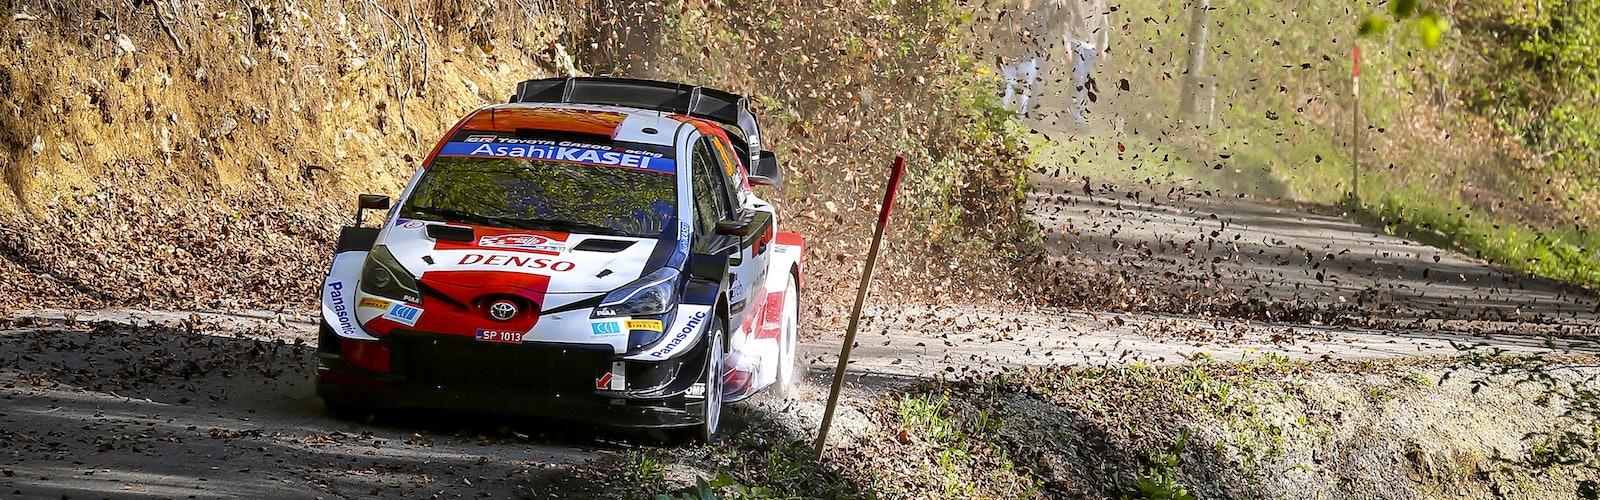 WRC_2021_Rd.3_234